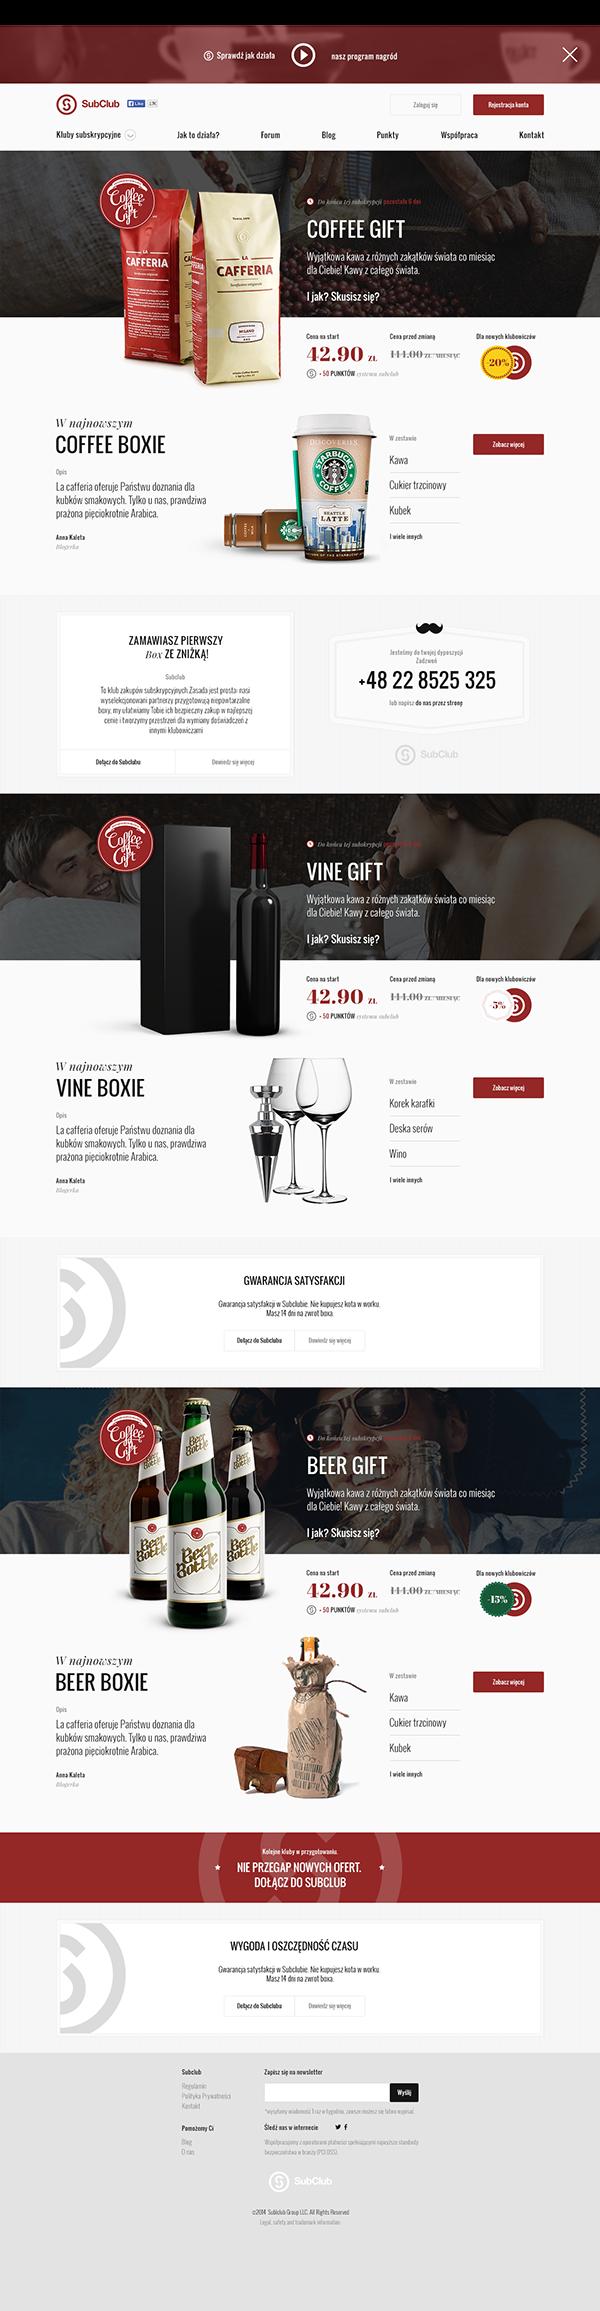 Subclub Website On Web Design Served Web Design Web Layout Design Web Design User Interface